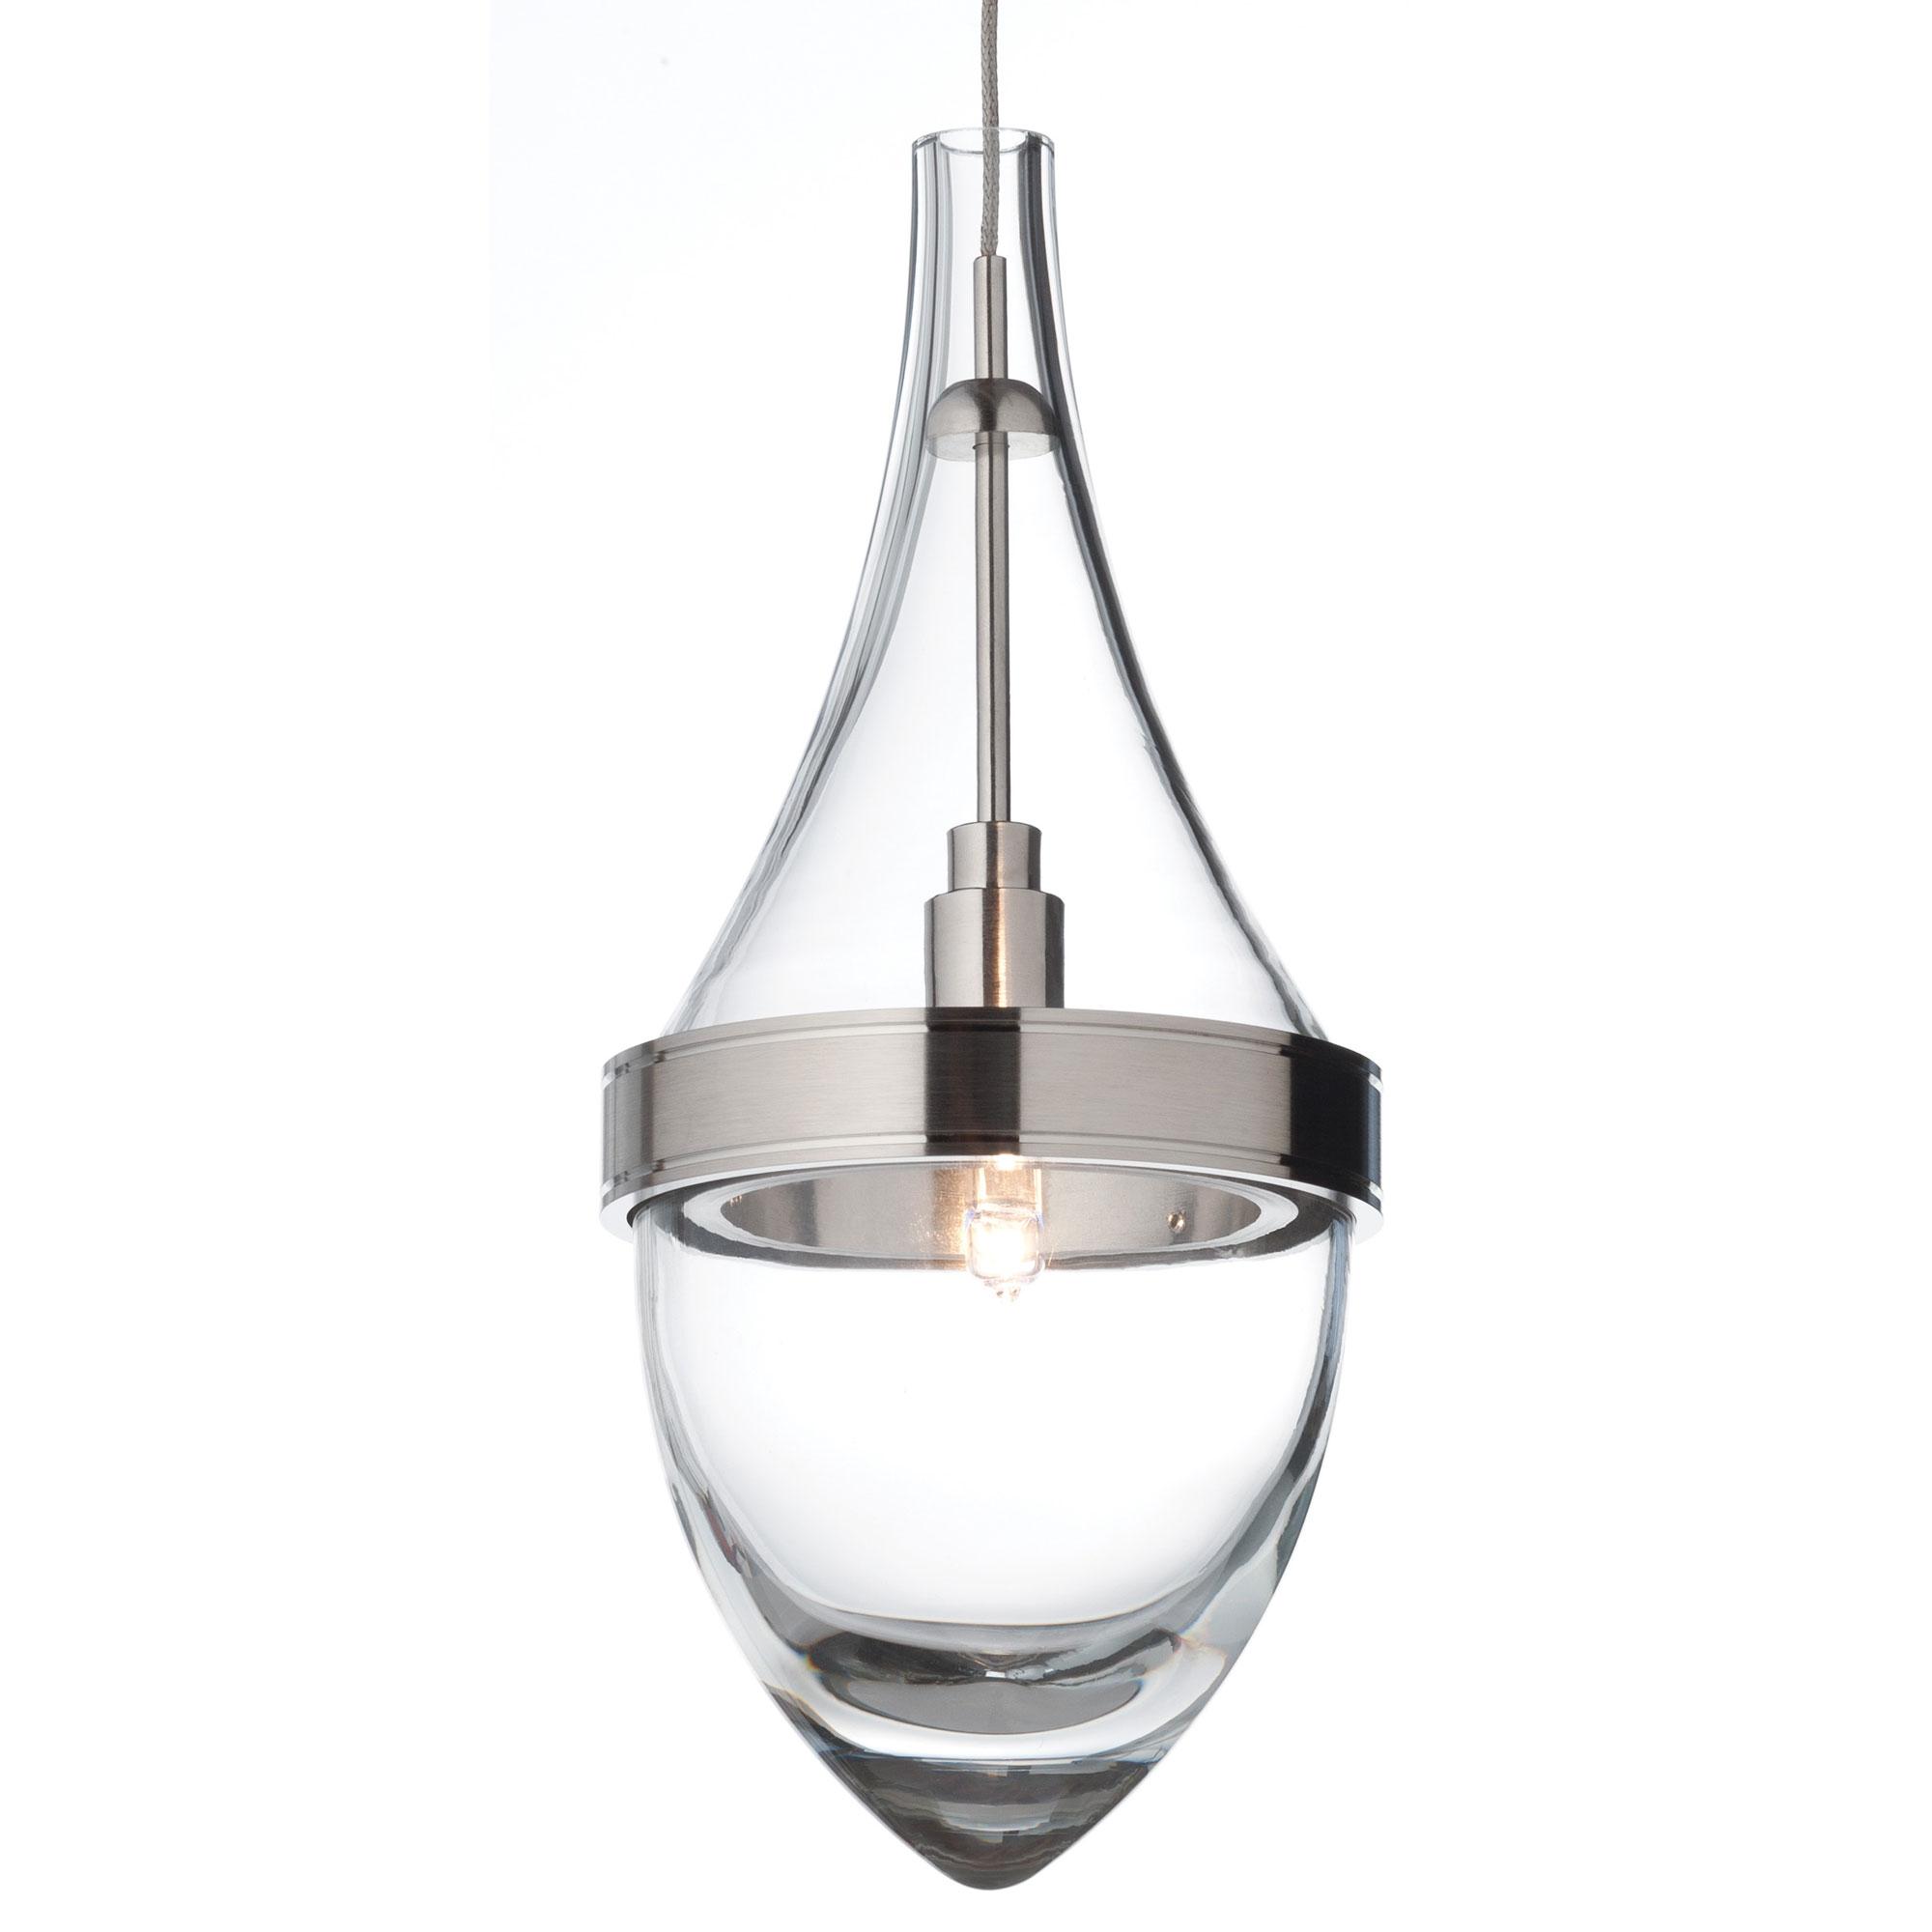 Monopoint Parfum Pendant By Tech Lighting | 700MPPFMCLCLS